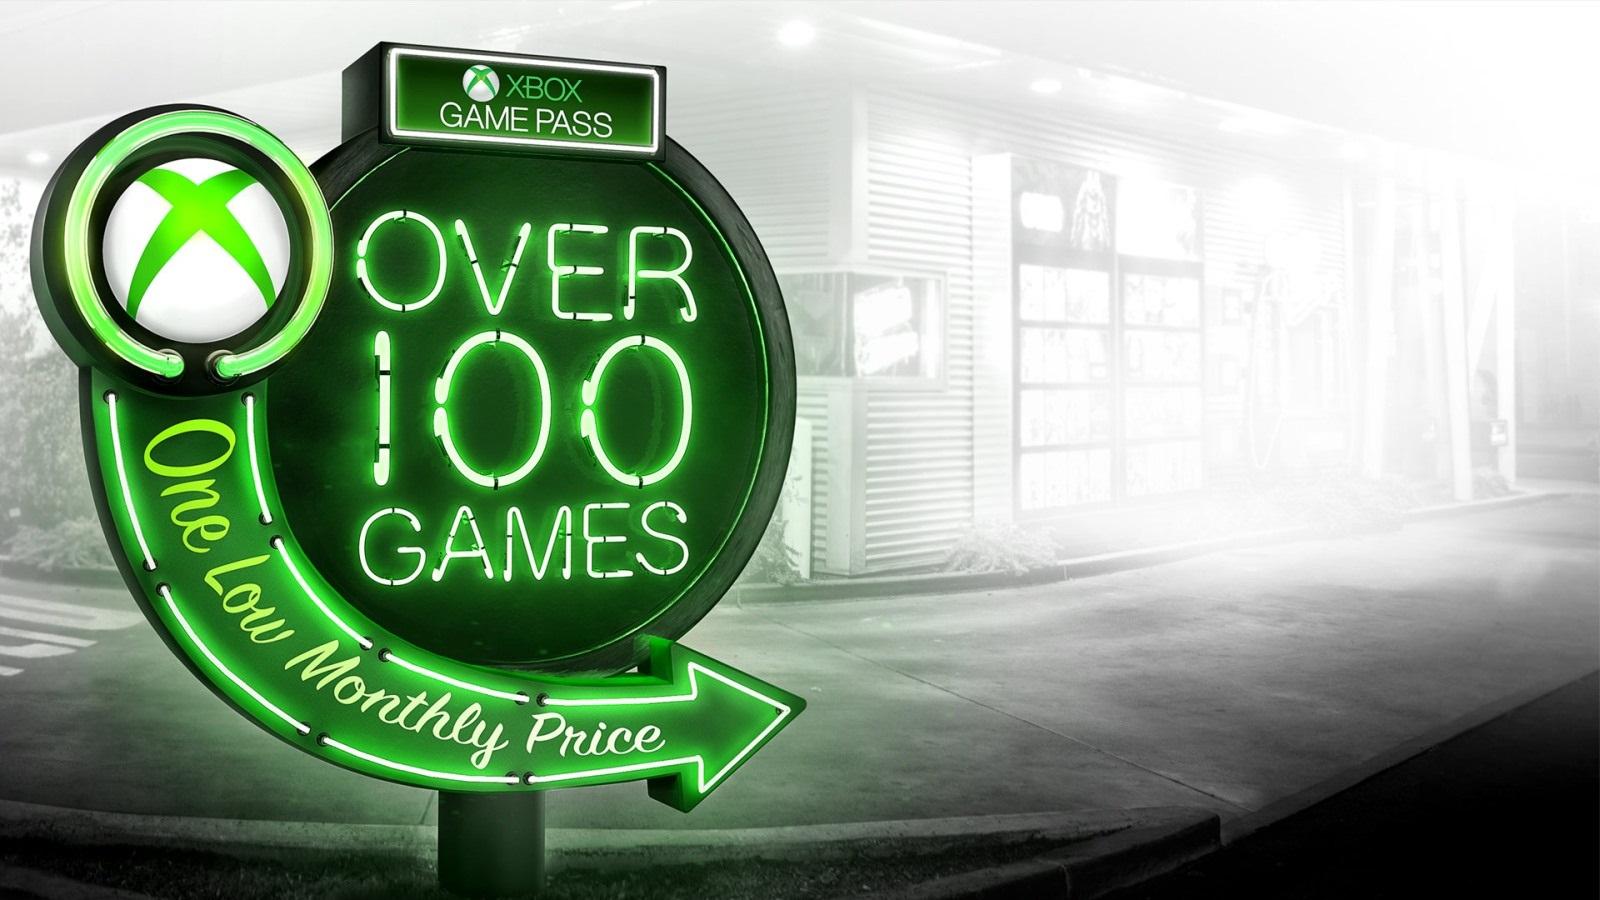 Xbox Game Pass; screenshot: logo